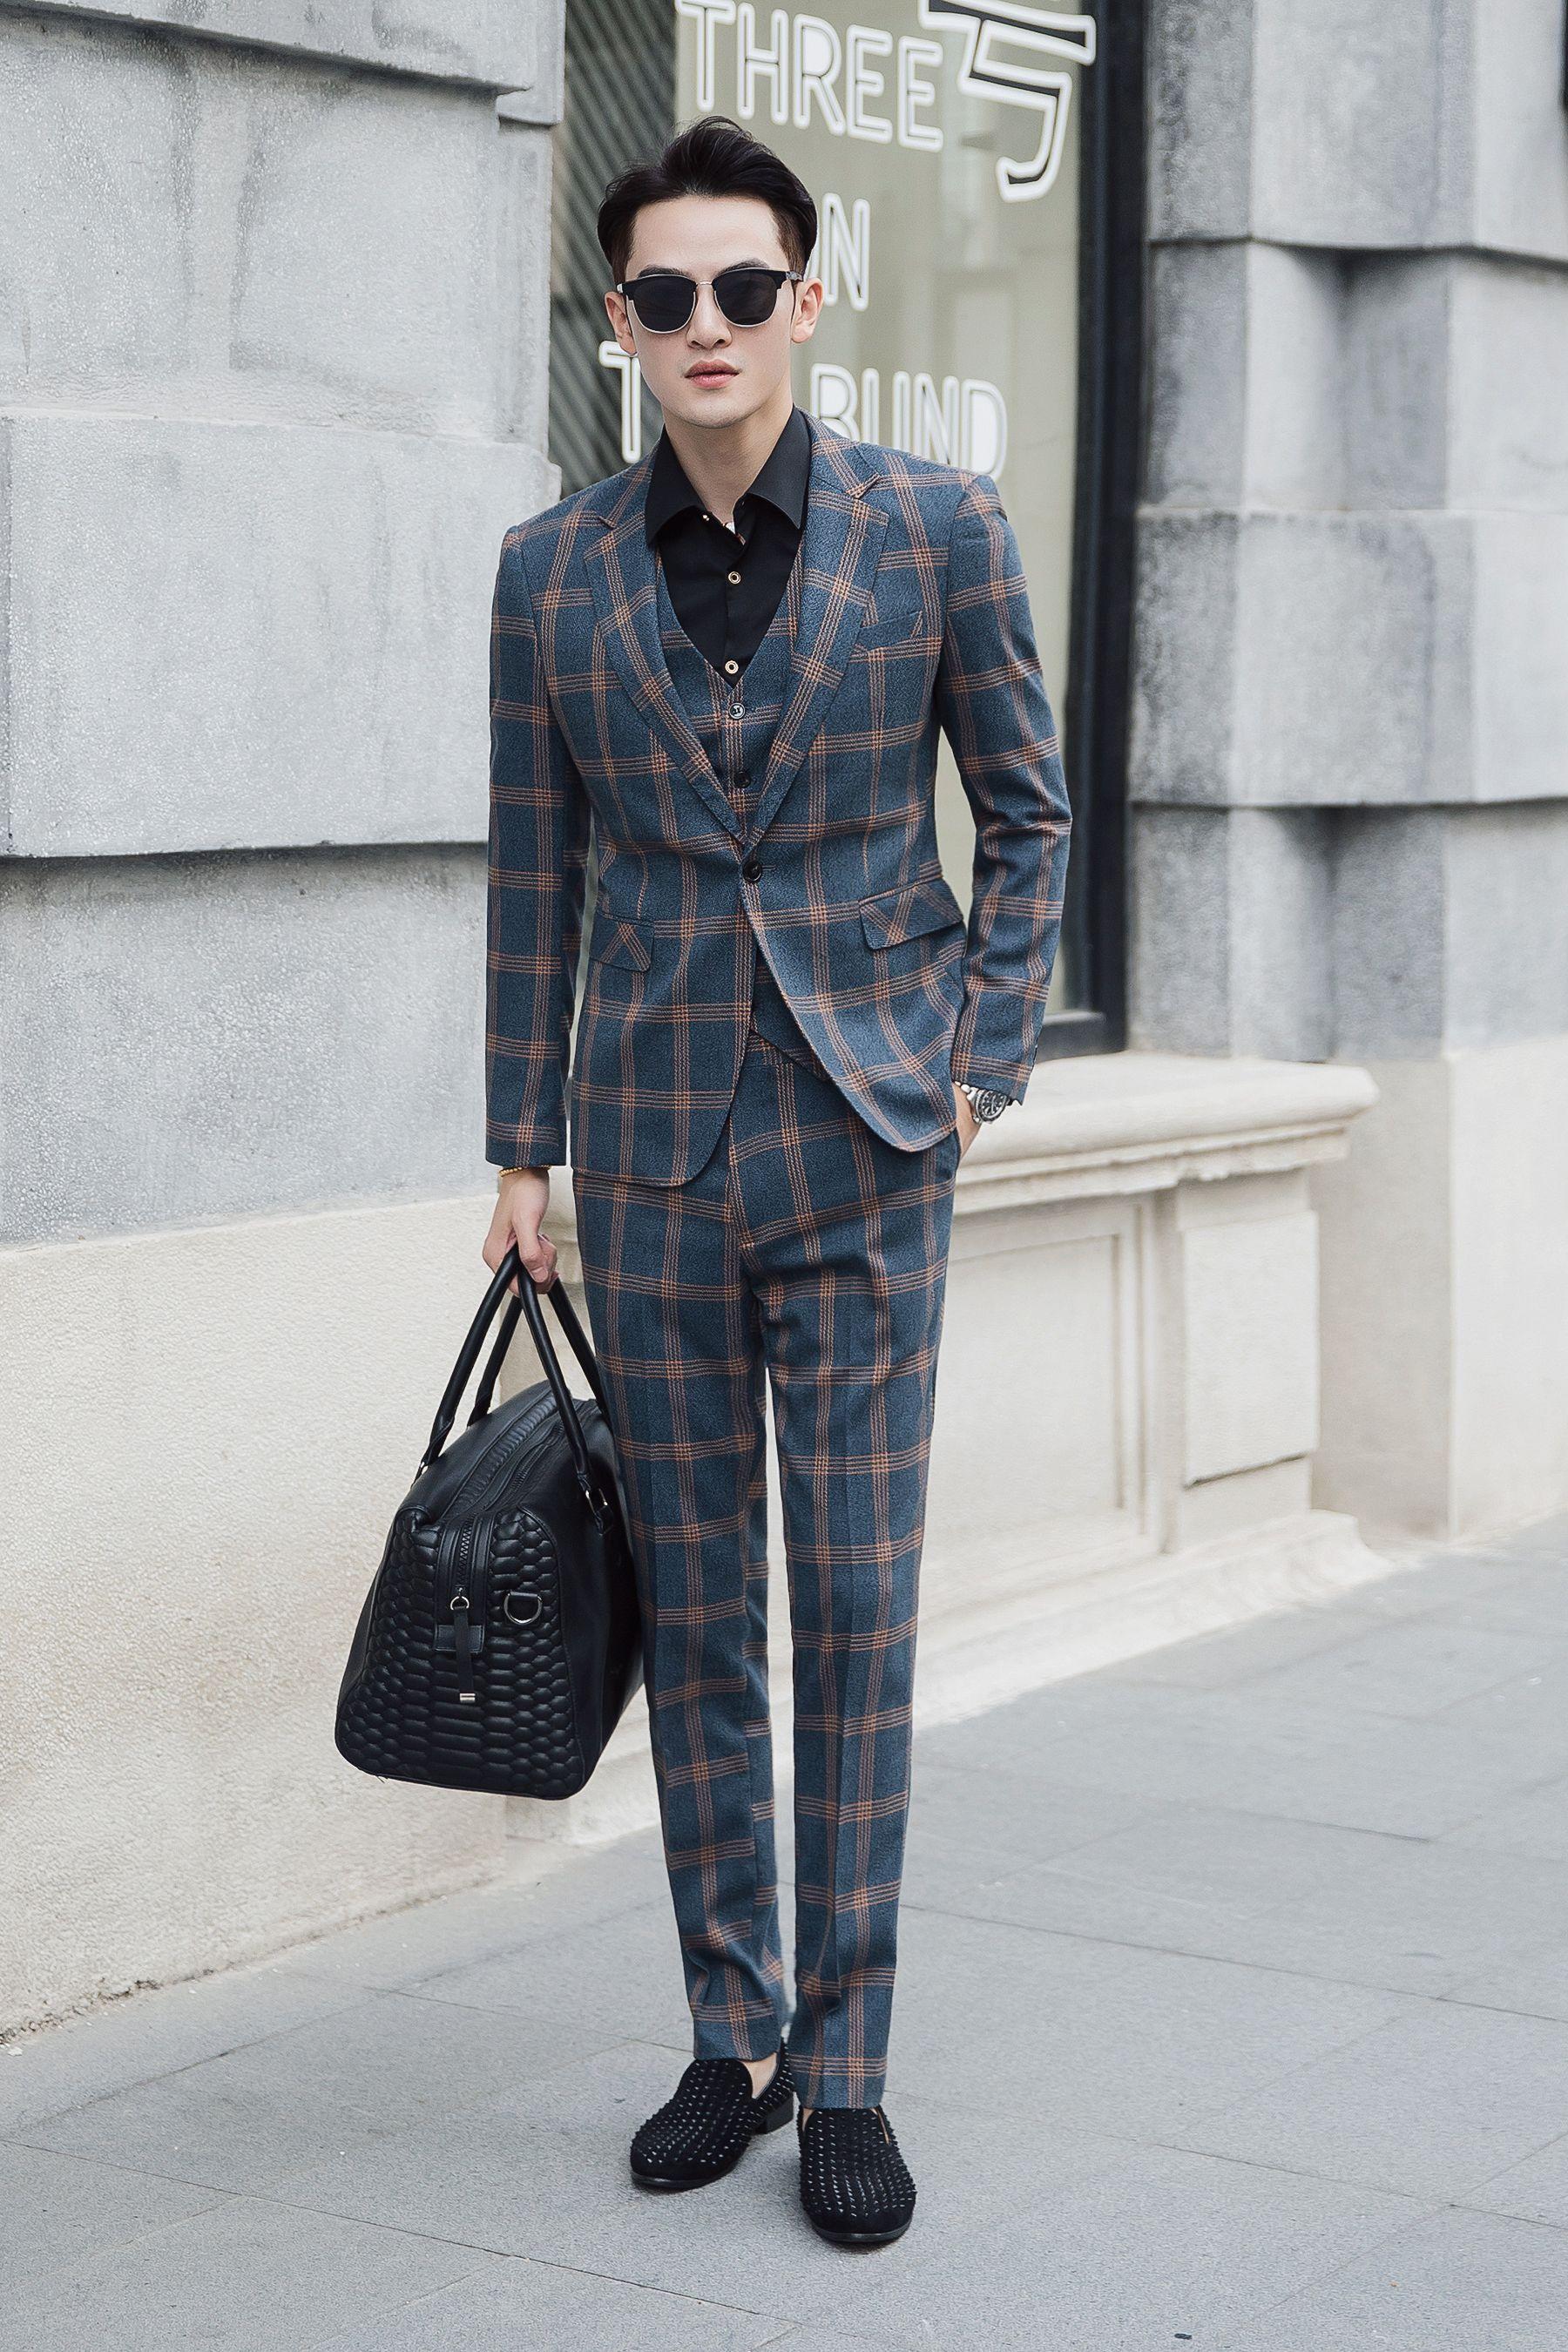 Plus size casual wedding dress  Plaid Wedding Dress Suits for Men Plus Size Casual Party Gentleman